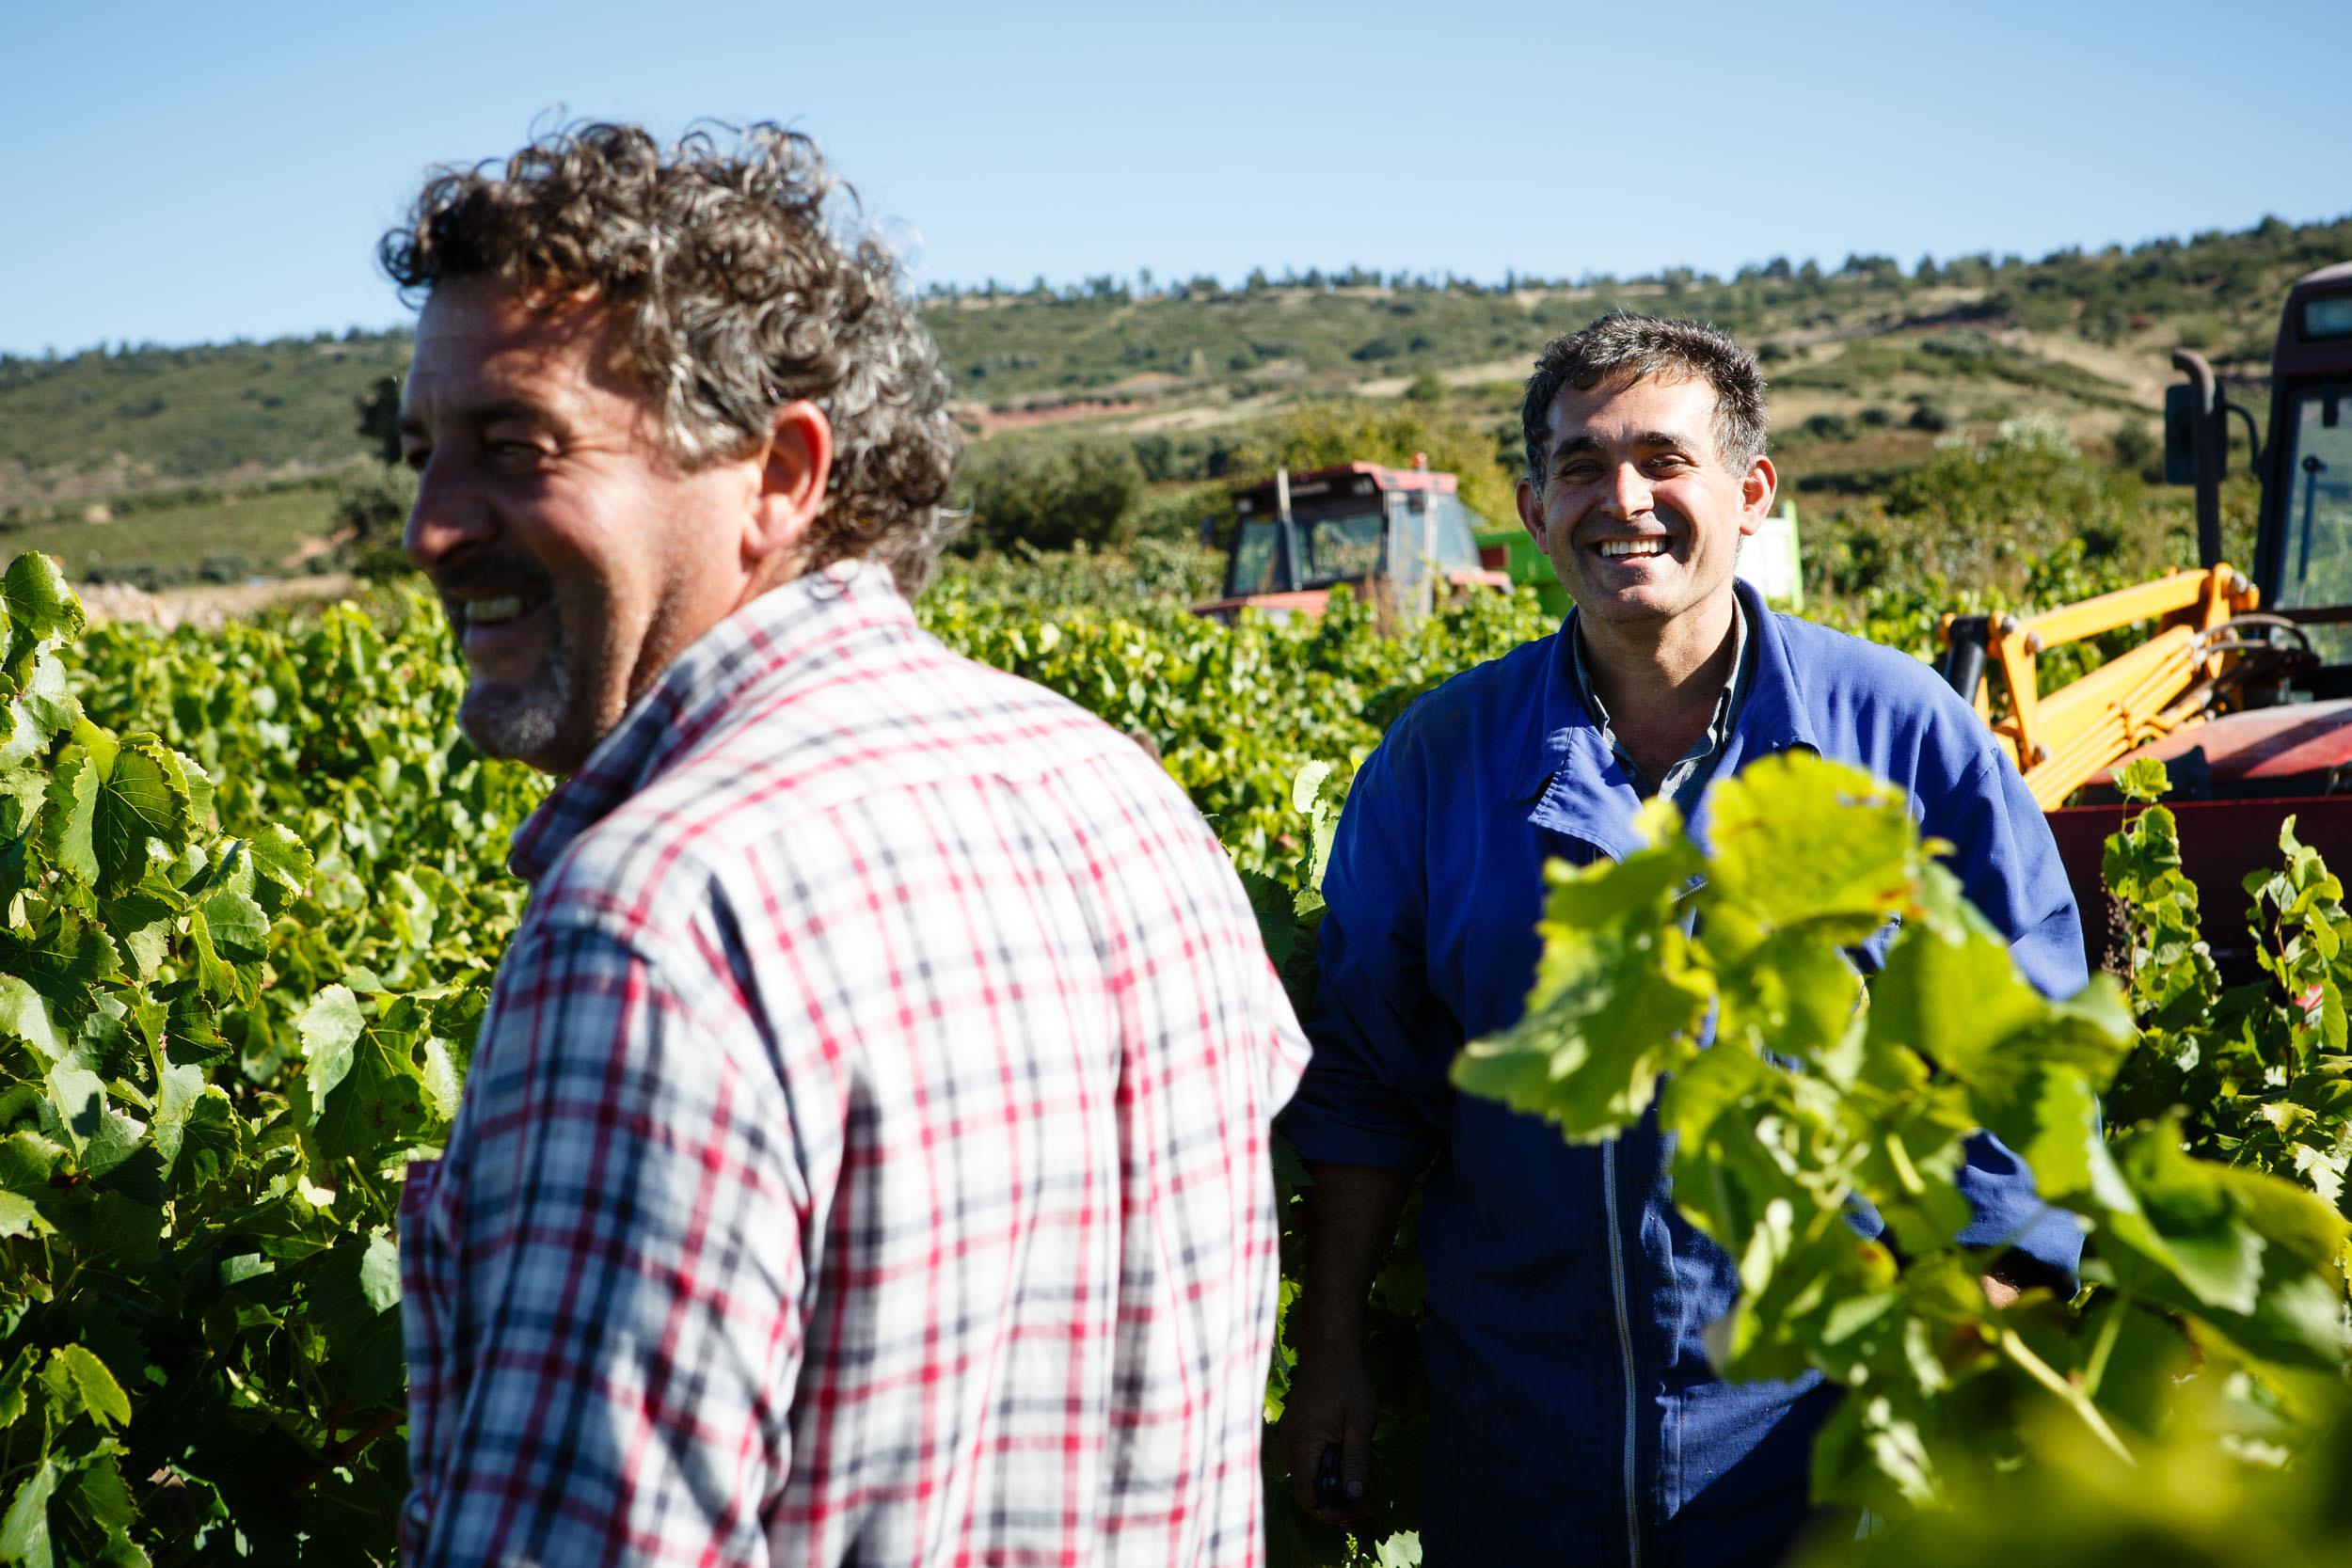 Fotografia Comercial de Vino La Rioja - Bodegas San Pedro Apostol Huercanos - James Sturcke Photographer | sturcke.org_009.jpg